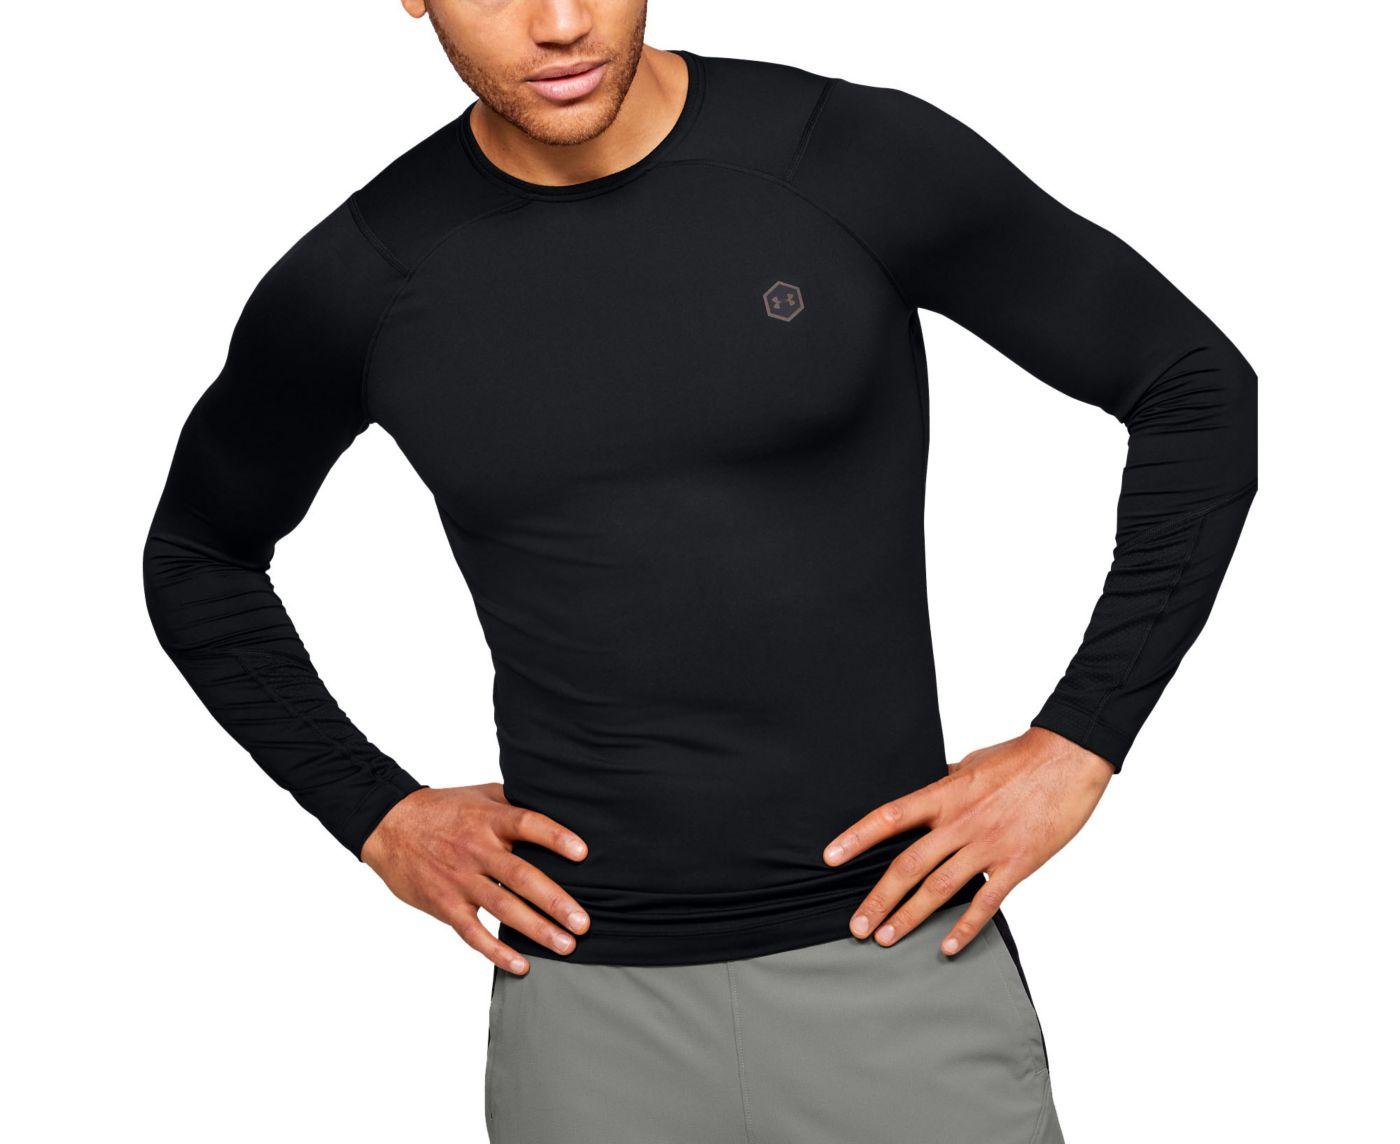 Under Armour Men's RUSH HeatGear Compression Long Sleeve Shirt